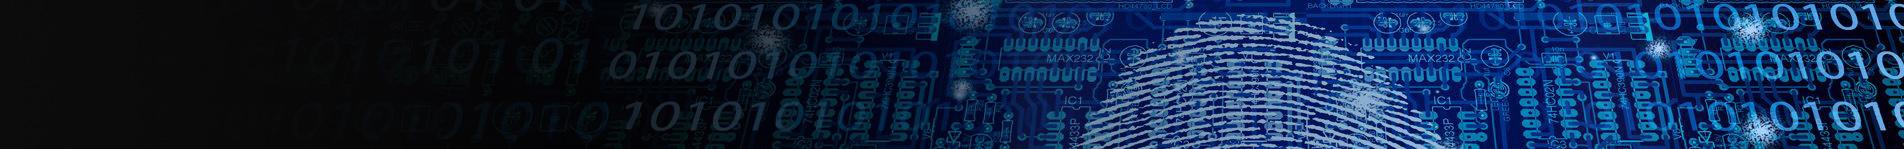 Digital Detective Technical Support Portal